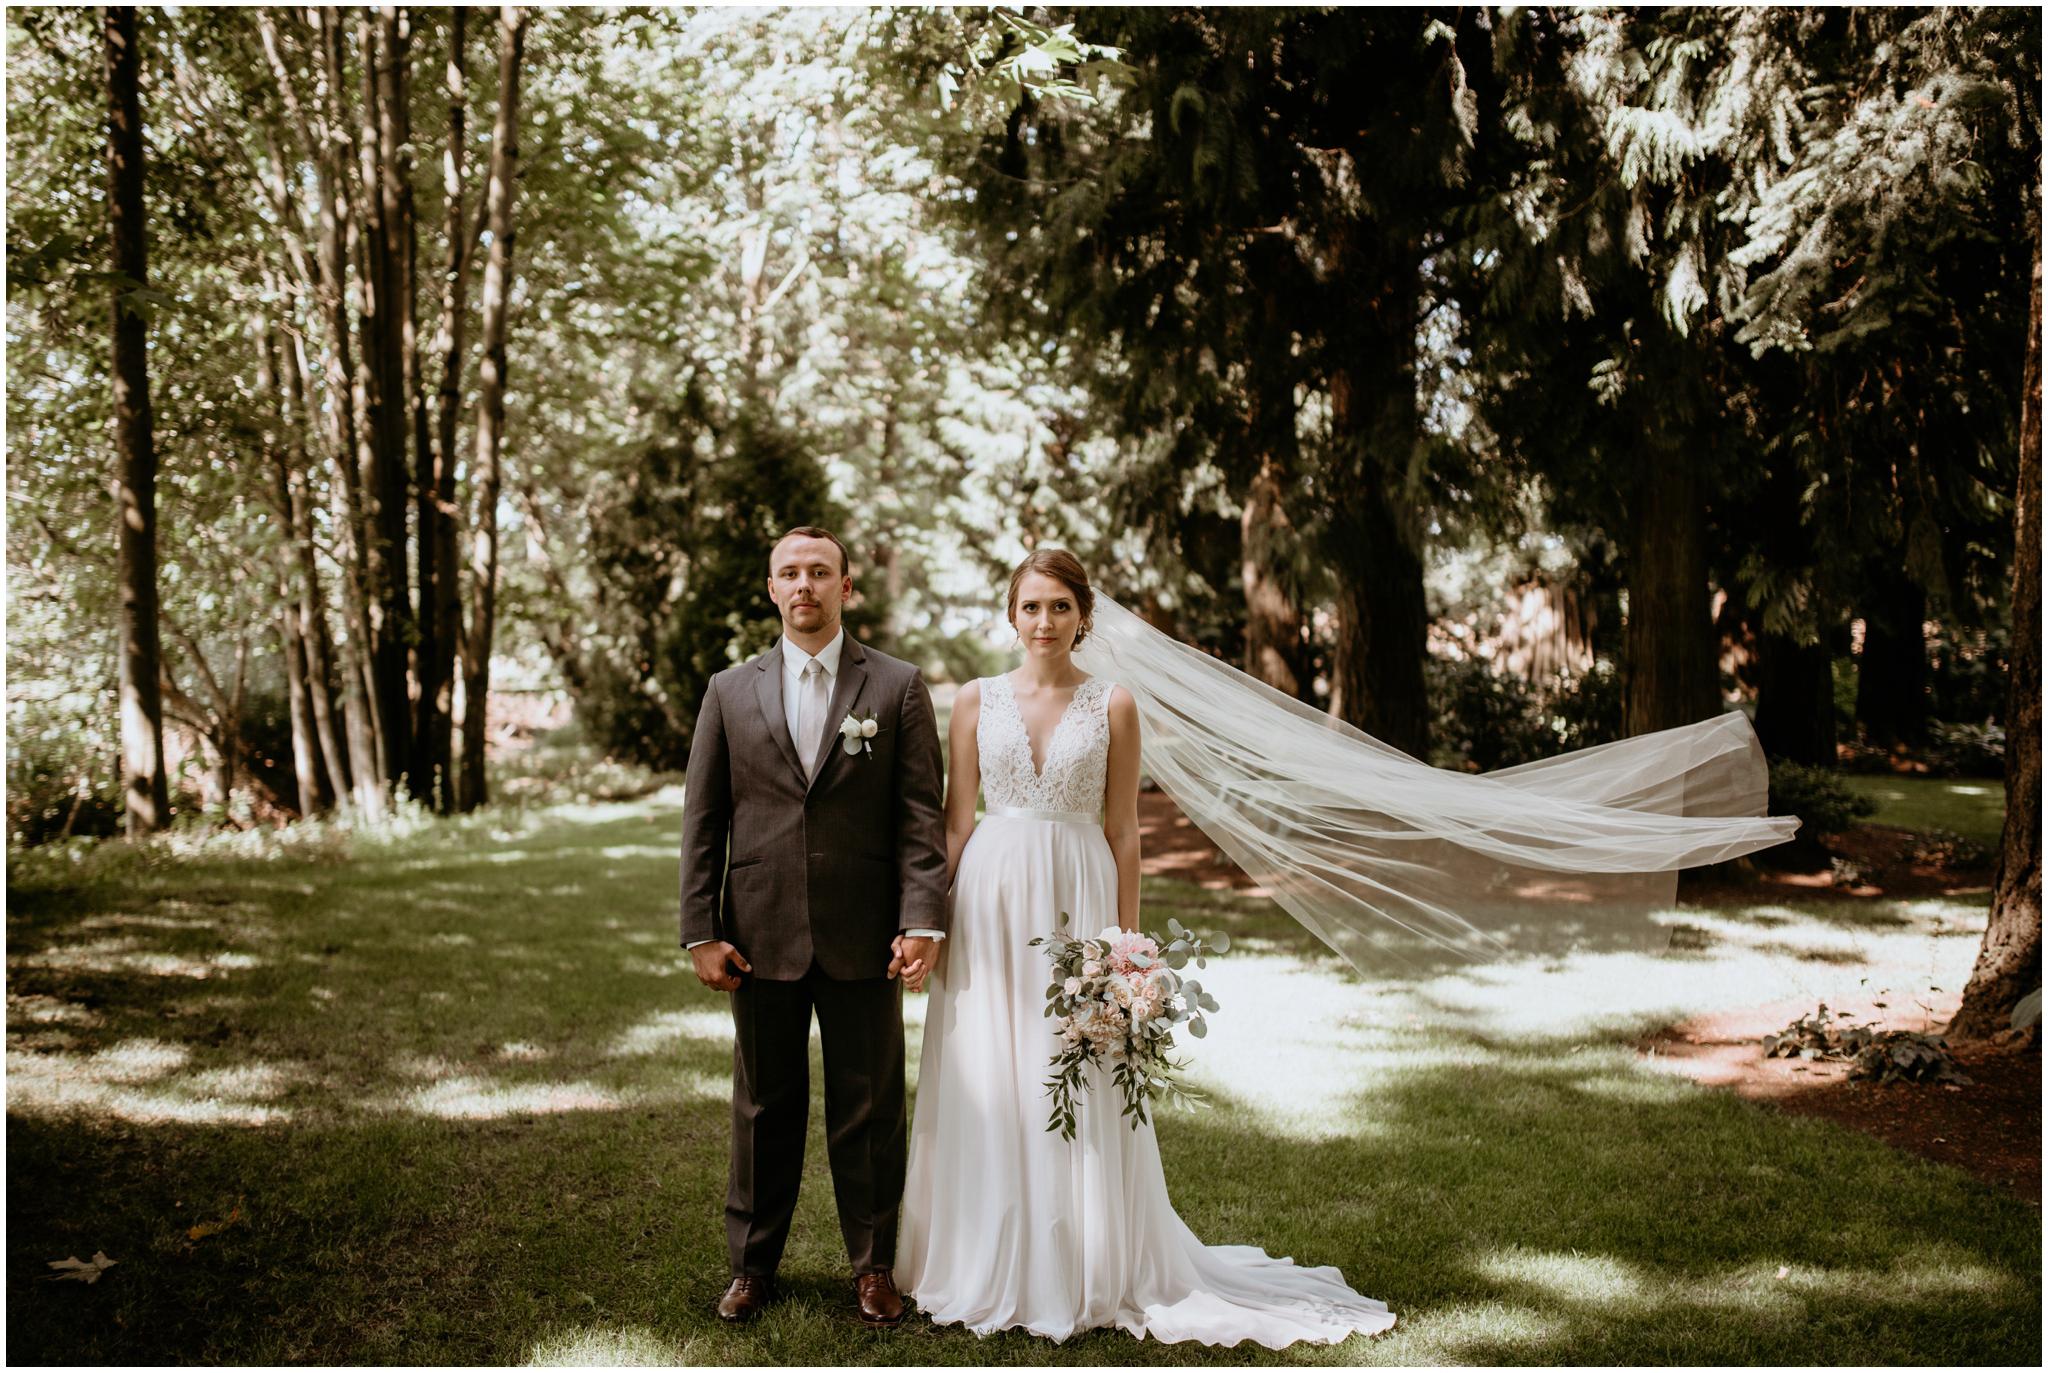 erin-and-tyler-evergreen-gardens-bellingham-wedding-photographer-069.jpg